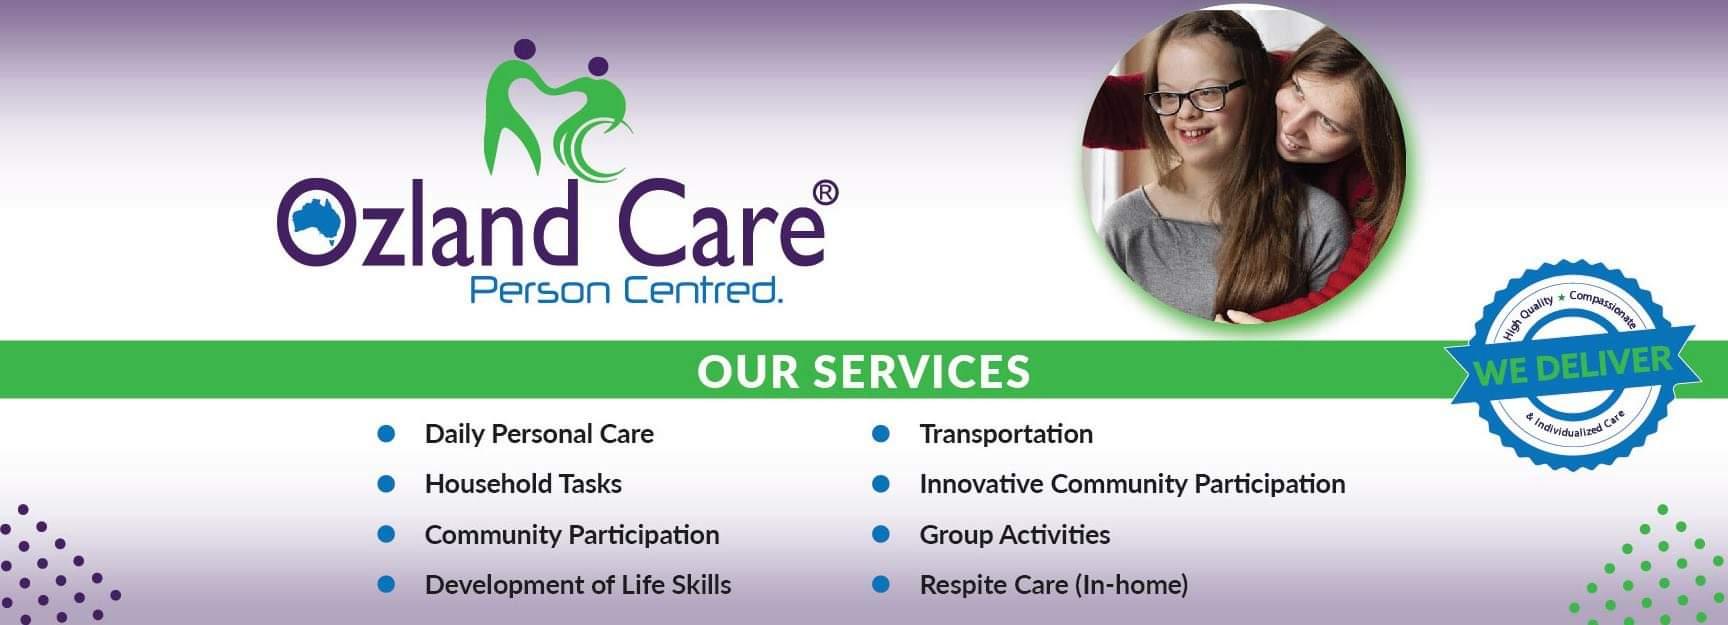 Ozland Care